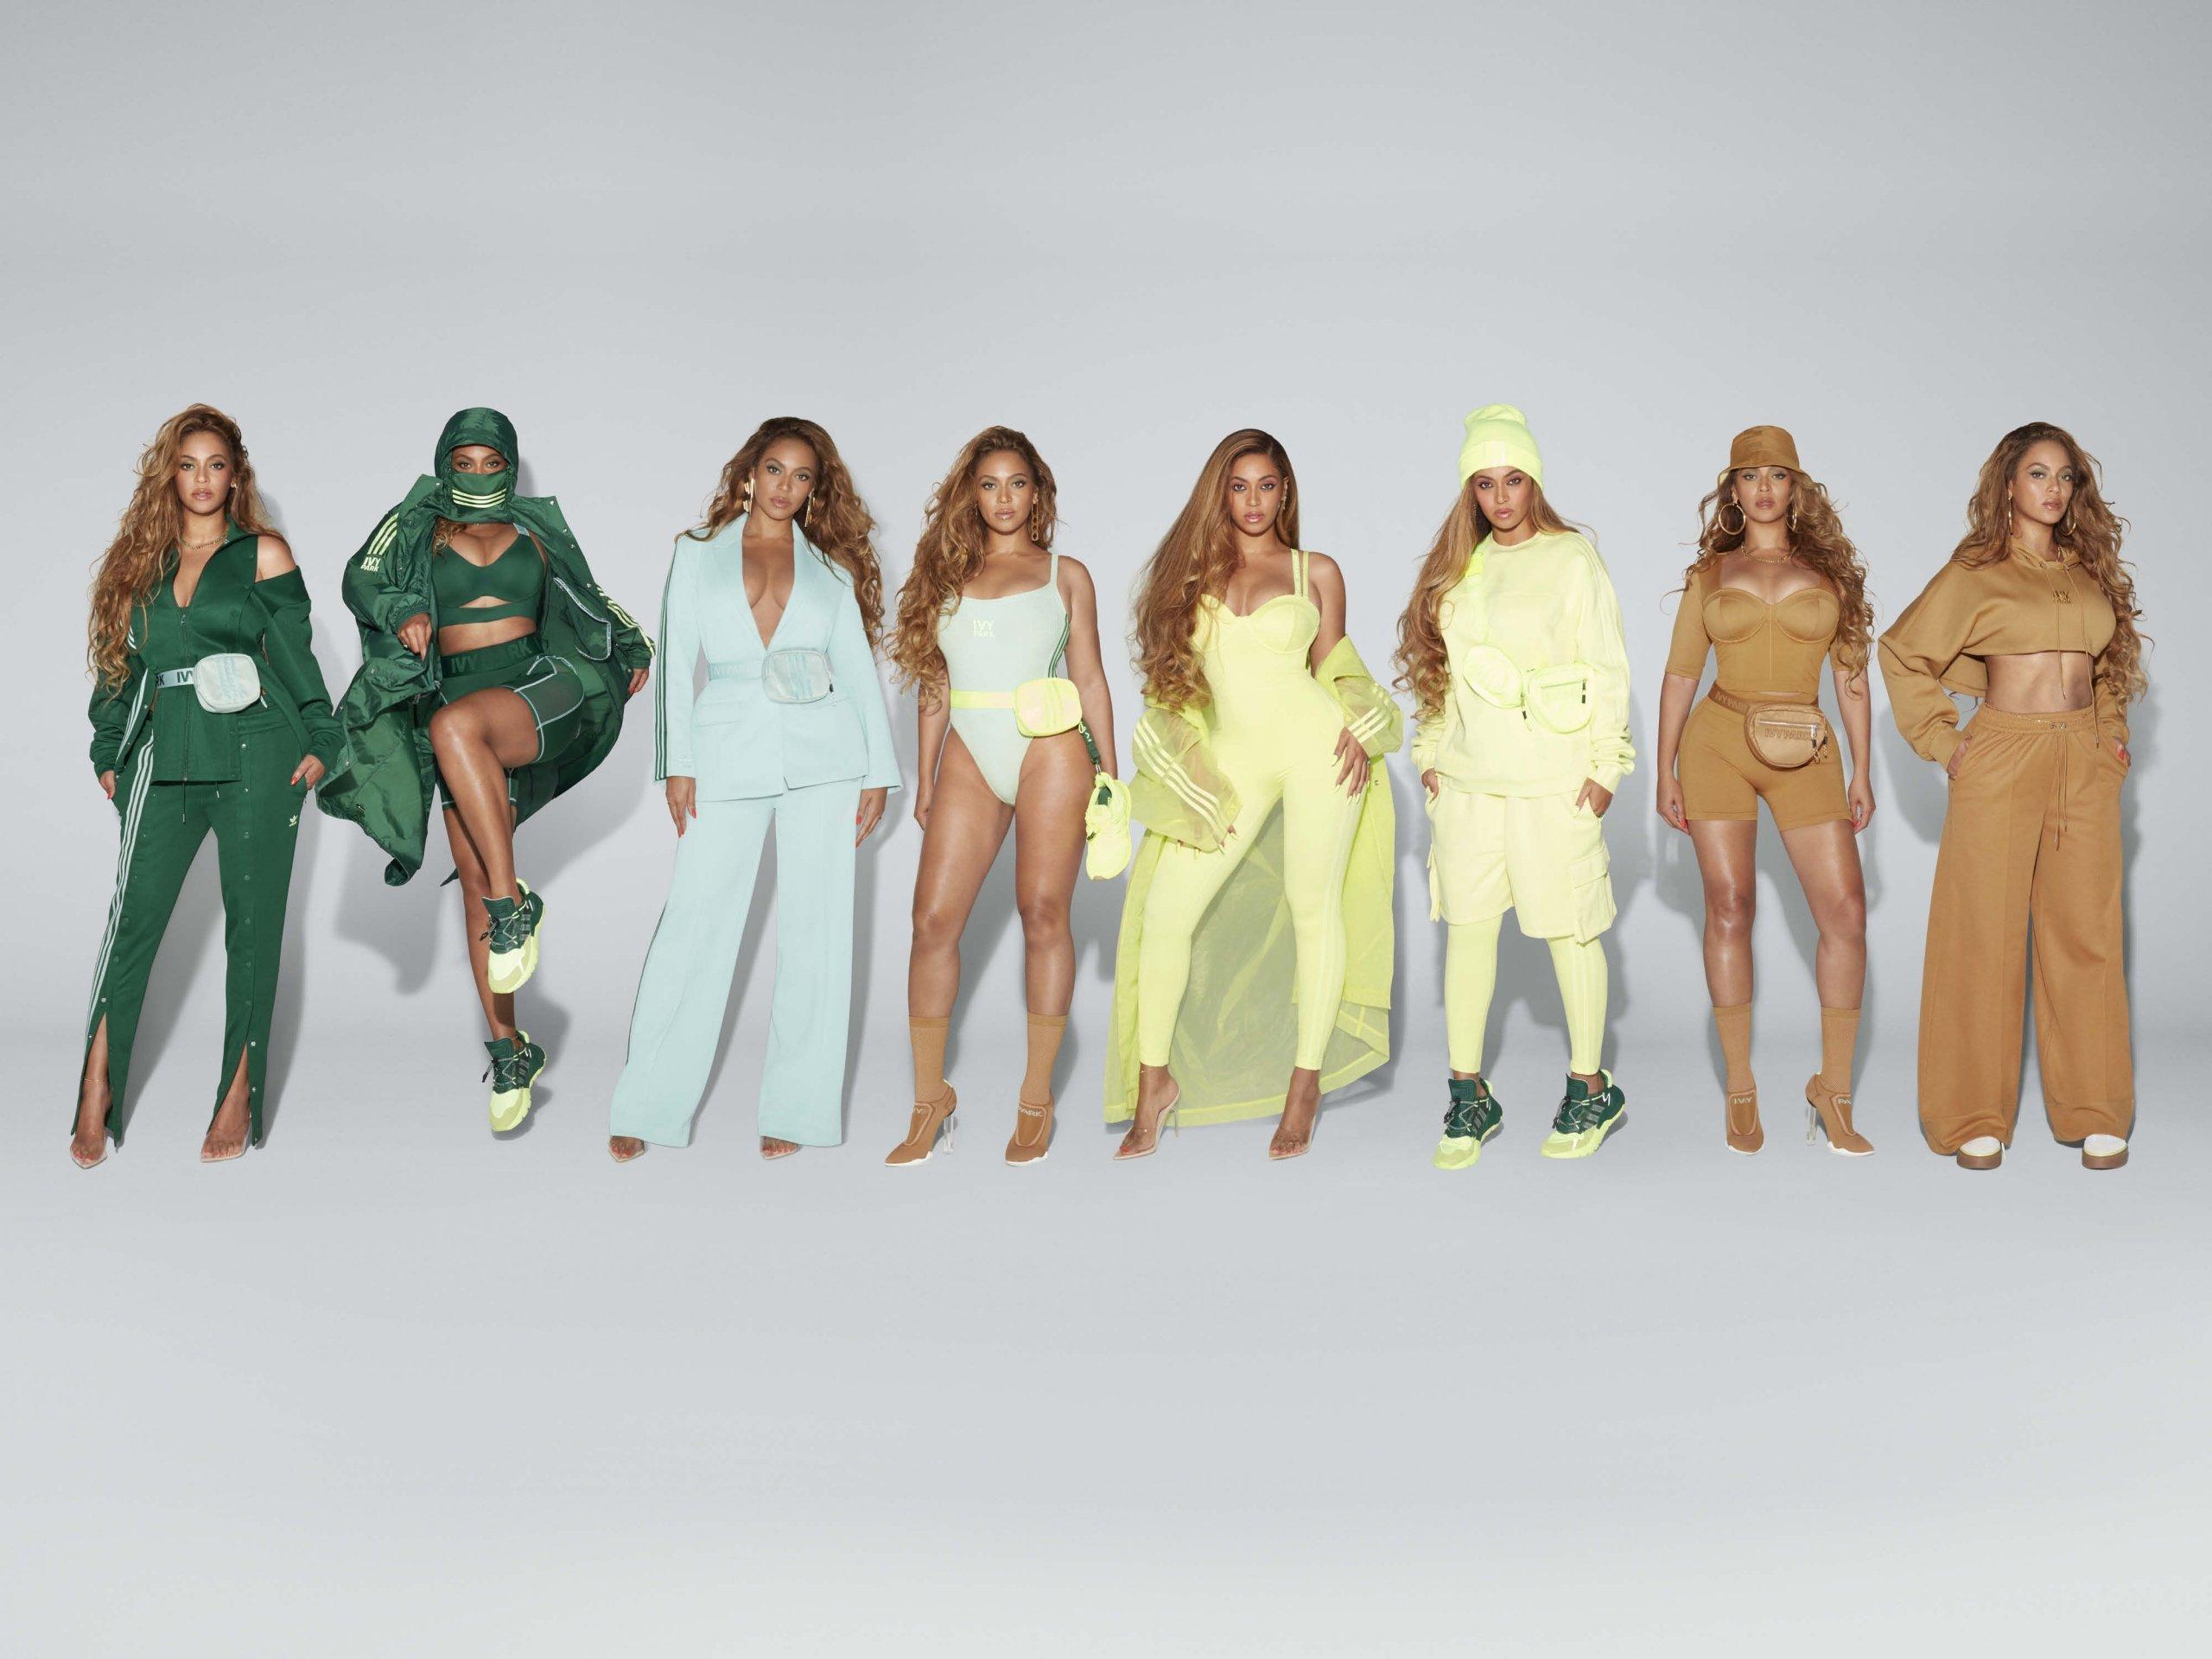 Beyoncé's Ivy Park kollektion Efterår/Vinter 2020